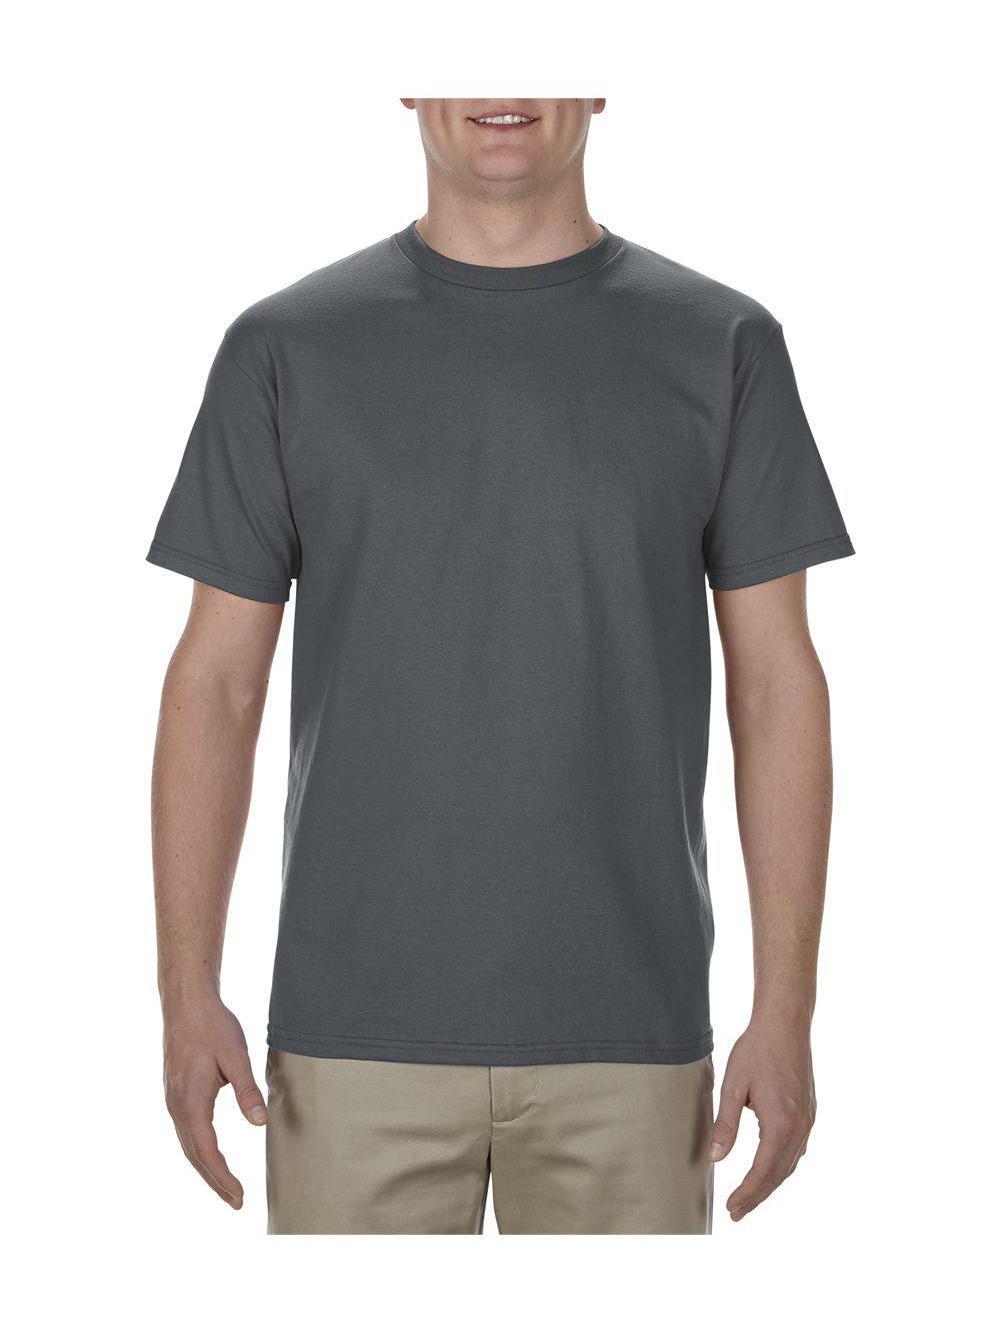 ALSTYLE-Premium-T-Shirt-1701 thumbnail 24